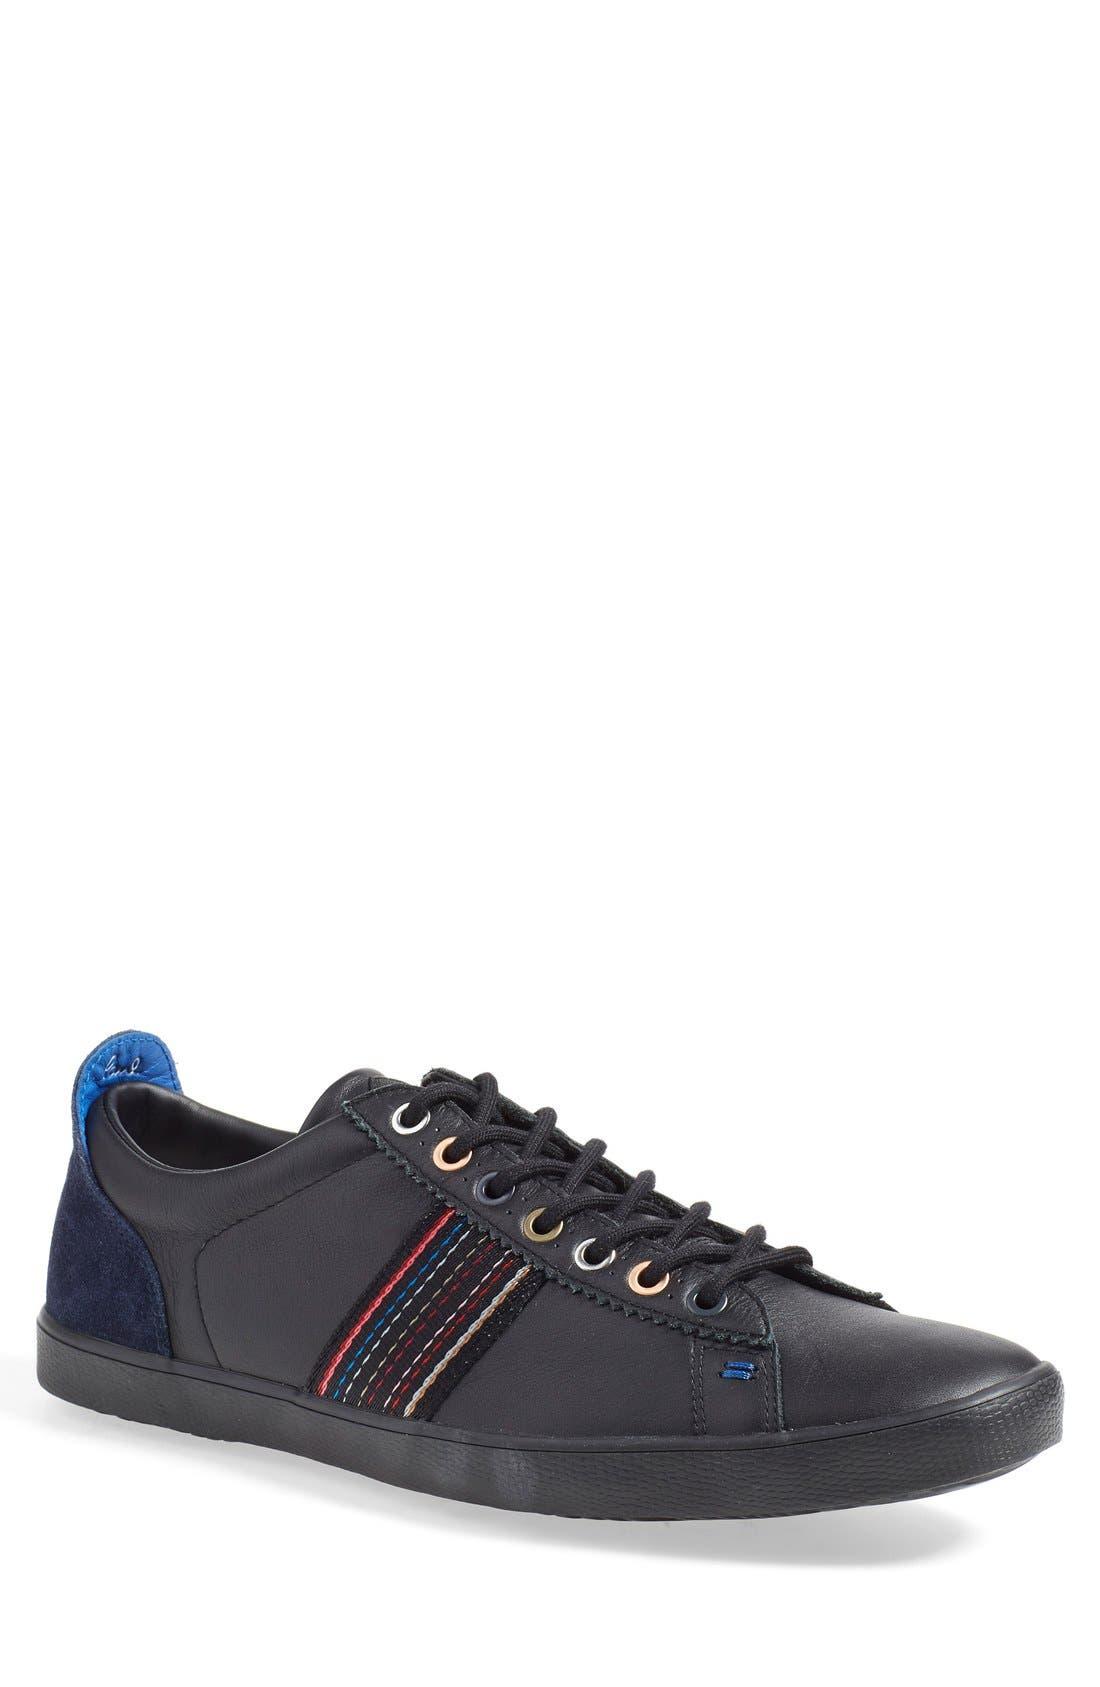 Alternate Image 1 Selected - Paul Smith 'Osmo' Sneaker (Men)